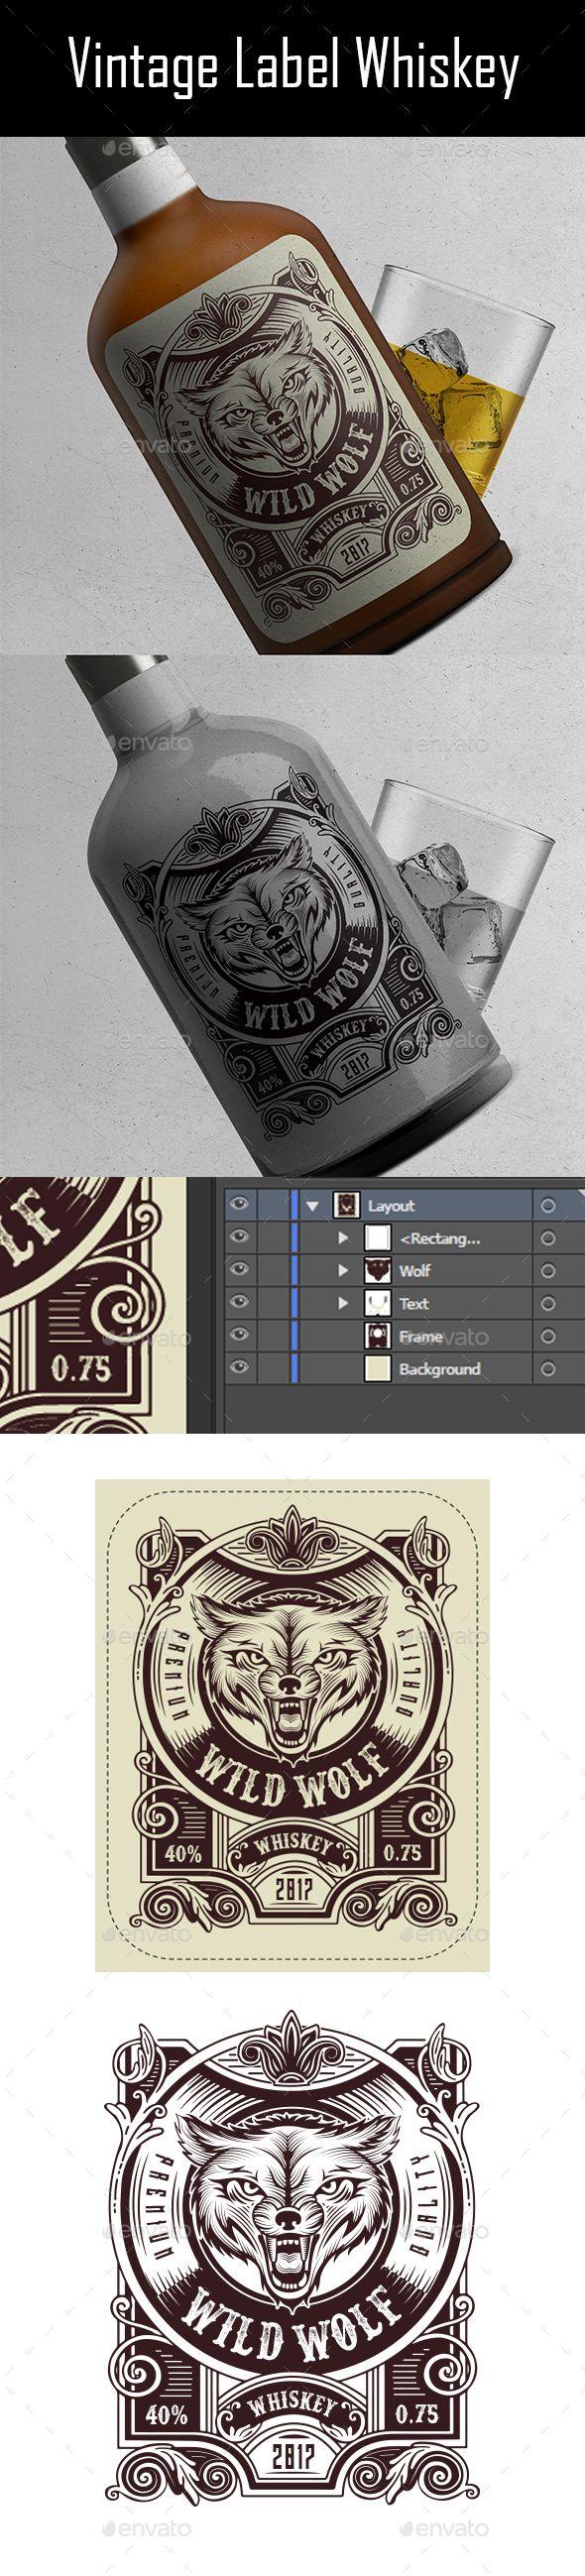 Vintage Label Whiskey v.3 | Vintage labels, Template and Print templates